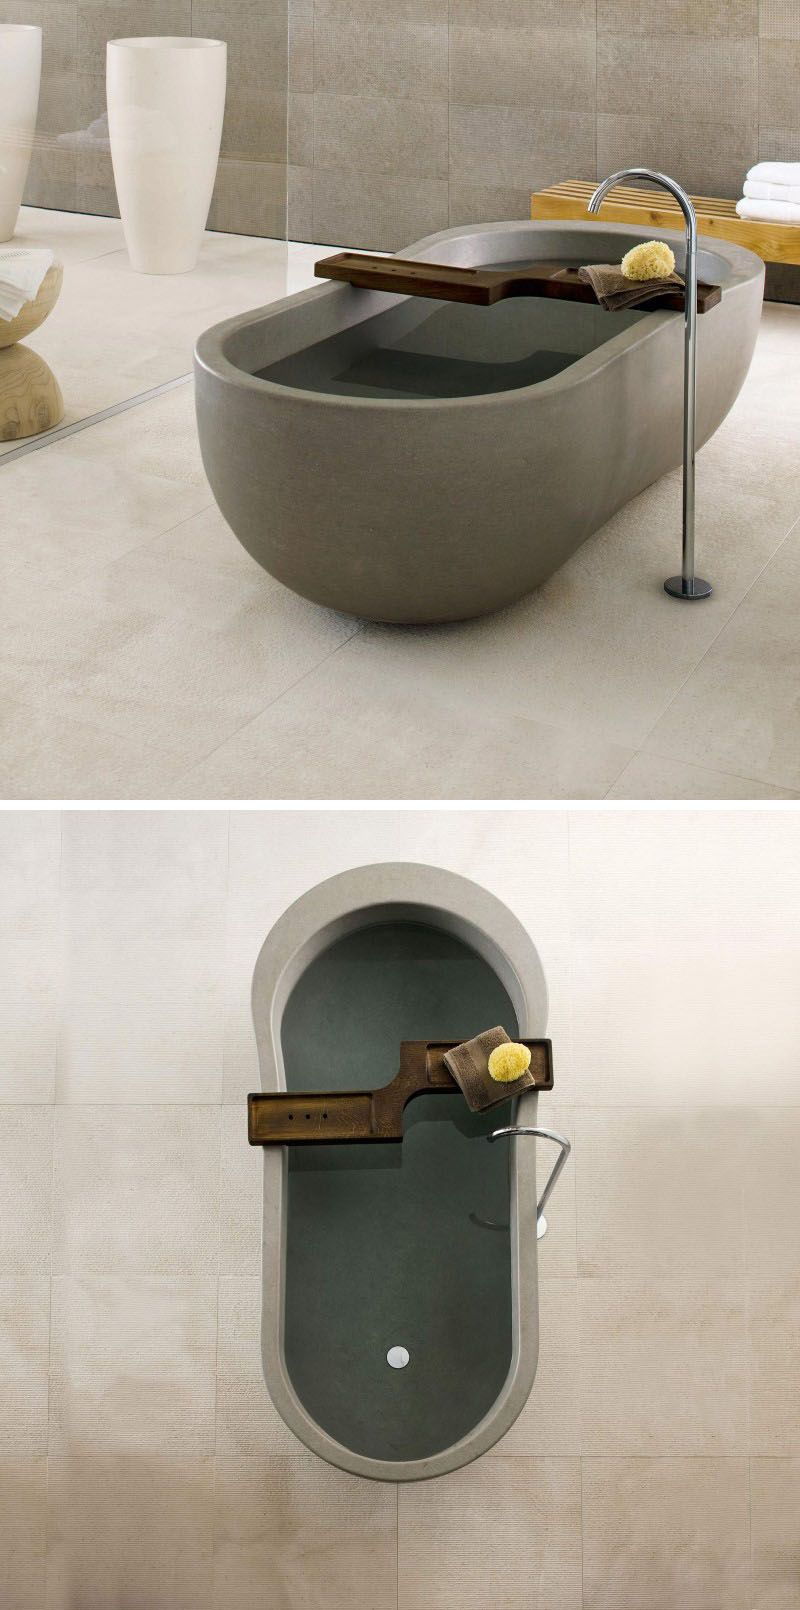 st forest products bathtubs bathtub papillon stone